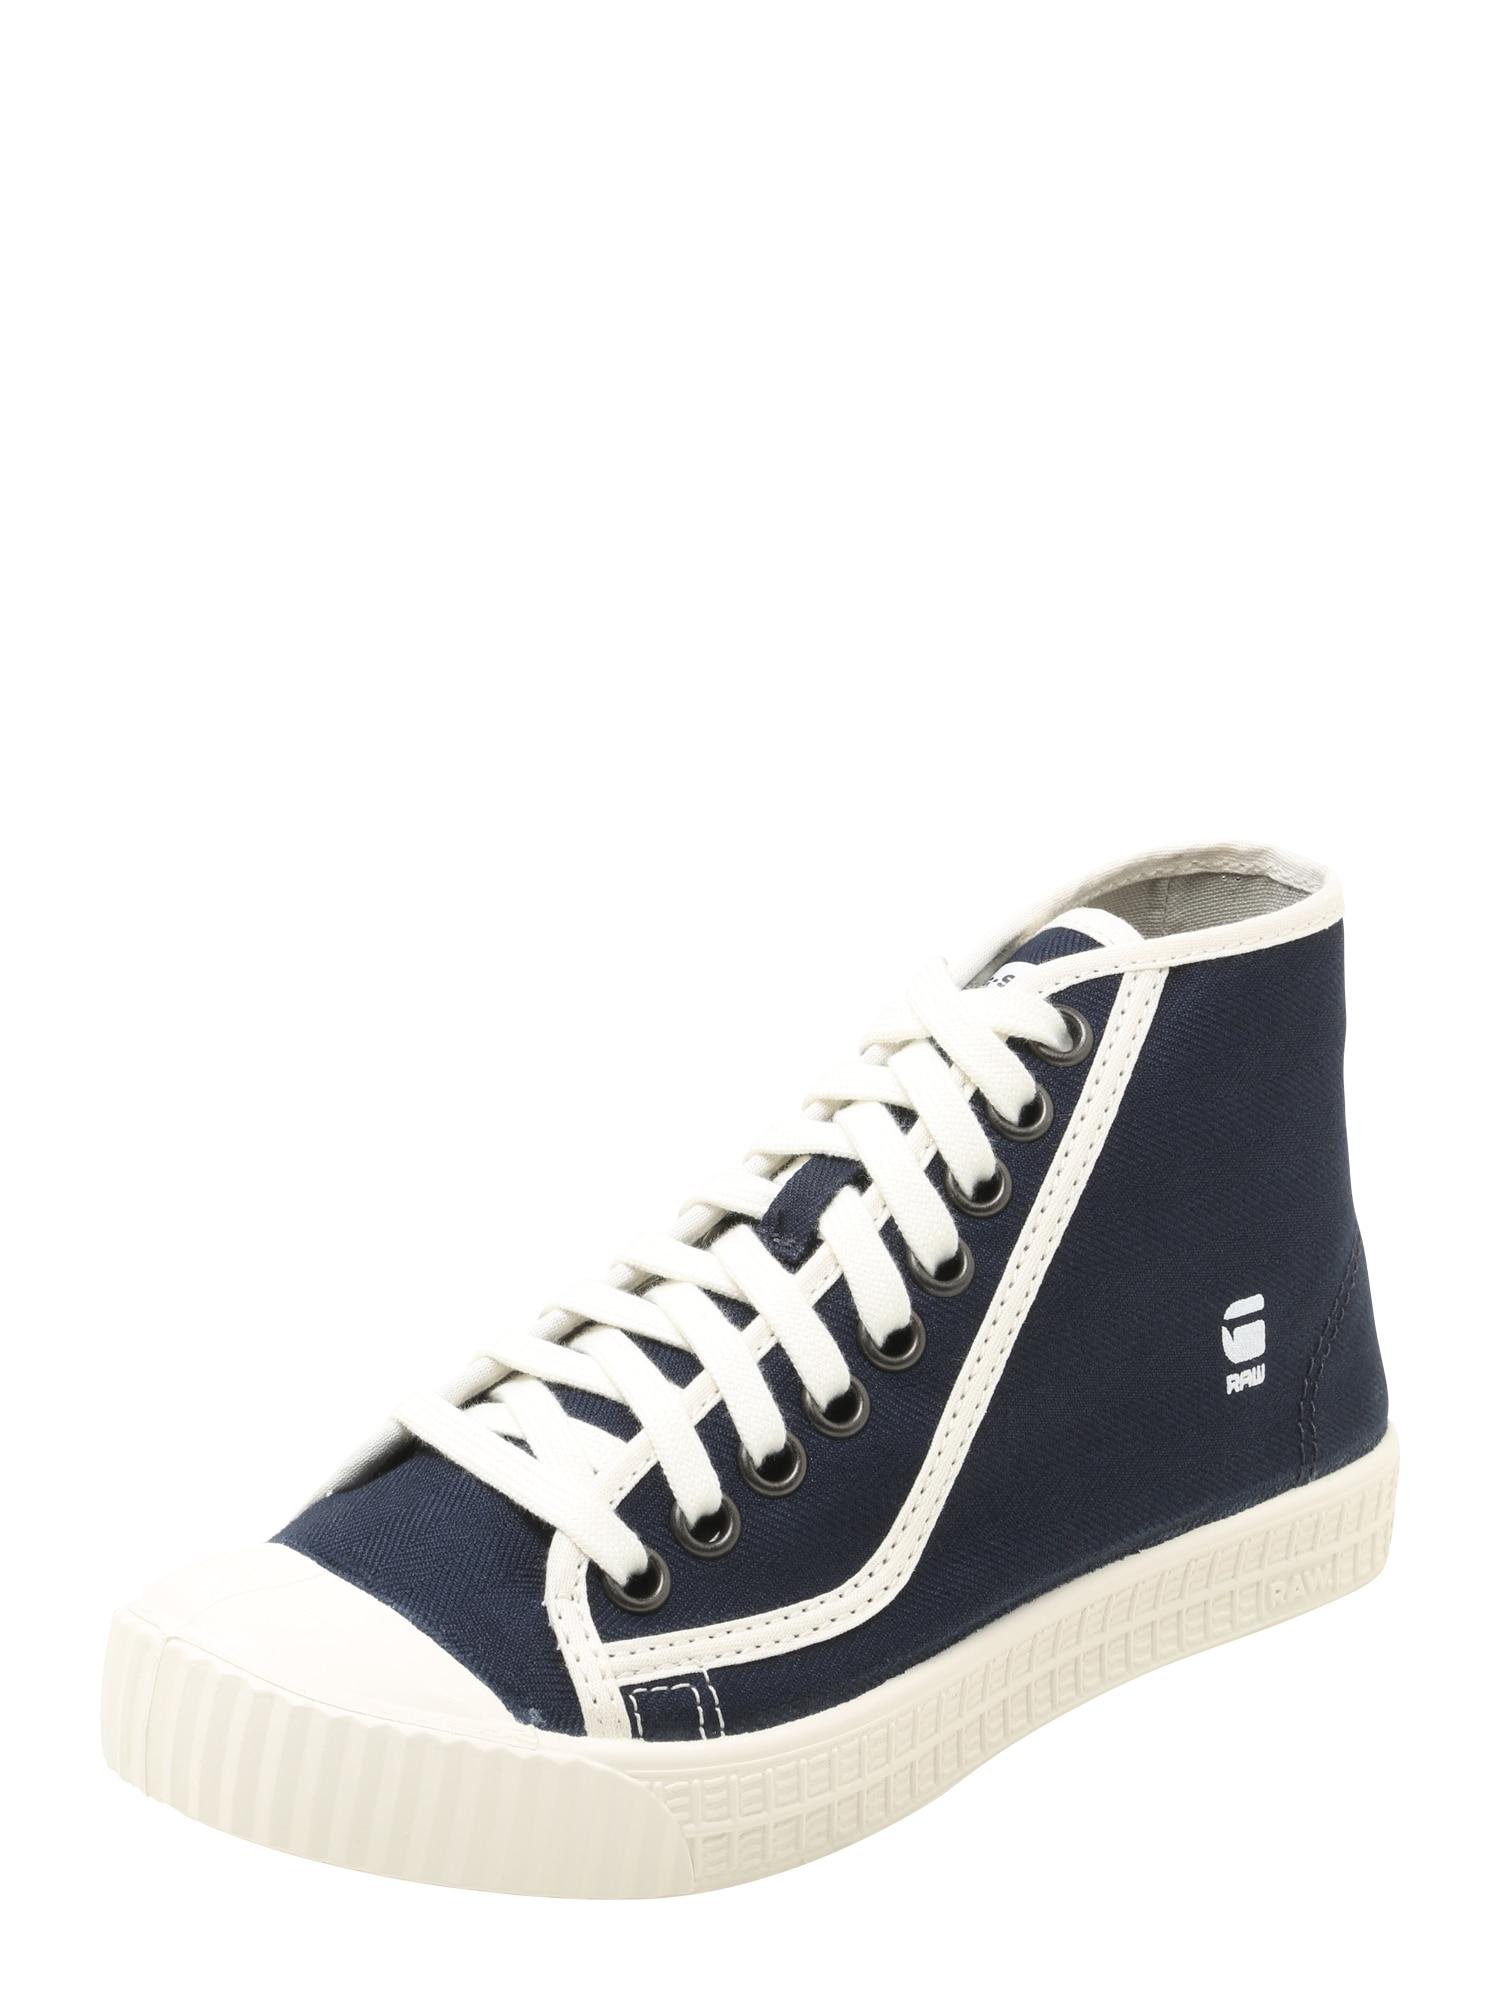 G-STAR RAW Dames Sneakers hoog ROVULC navy wit